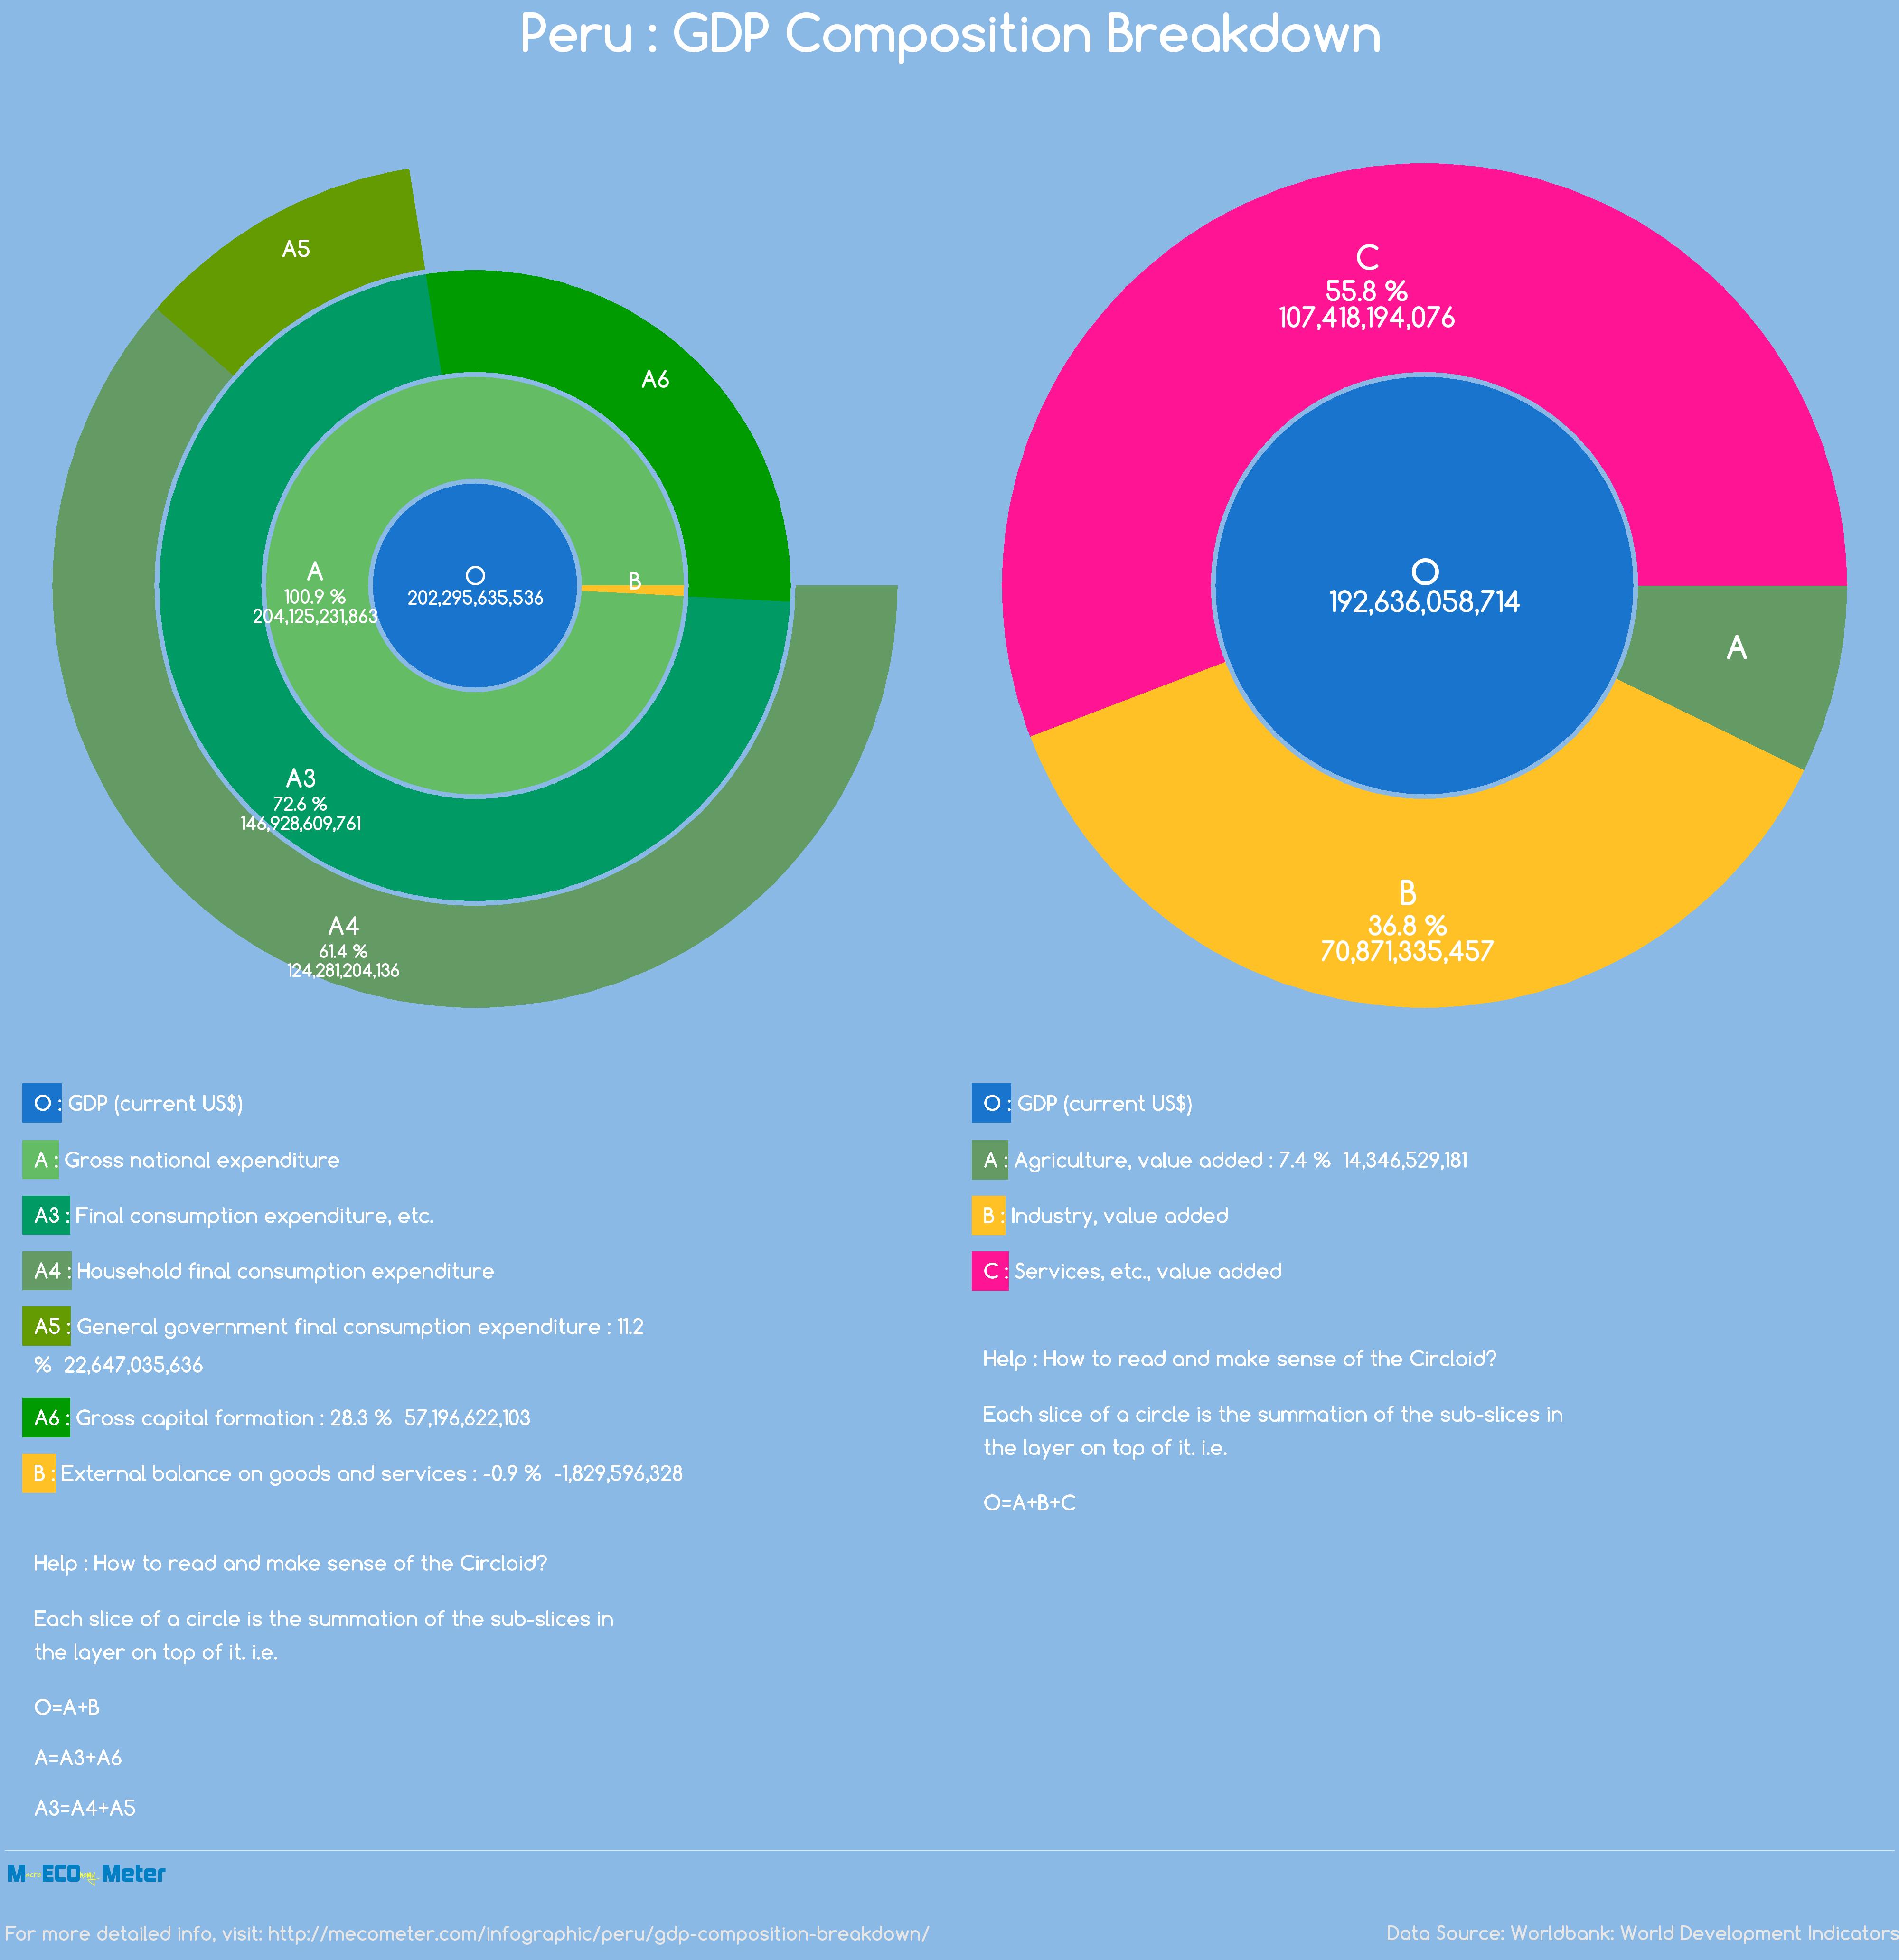 Peru : GDP Composition Breakdown